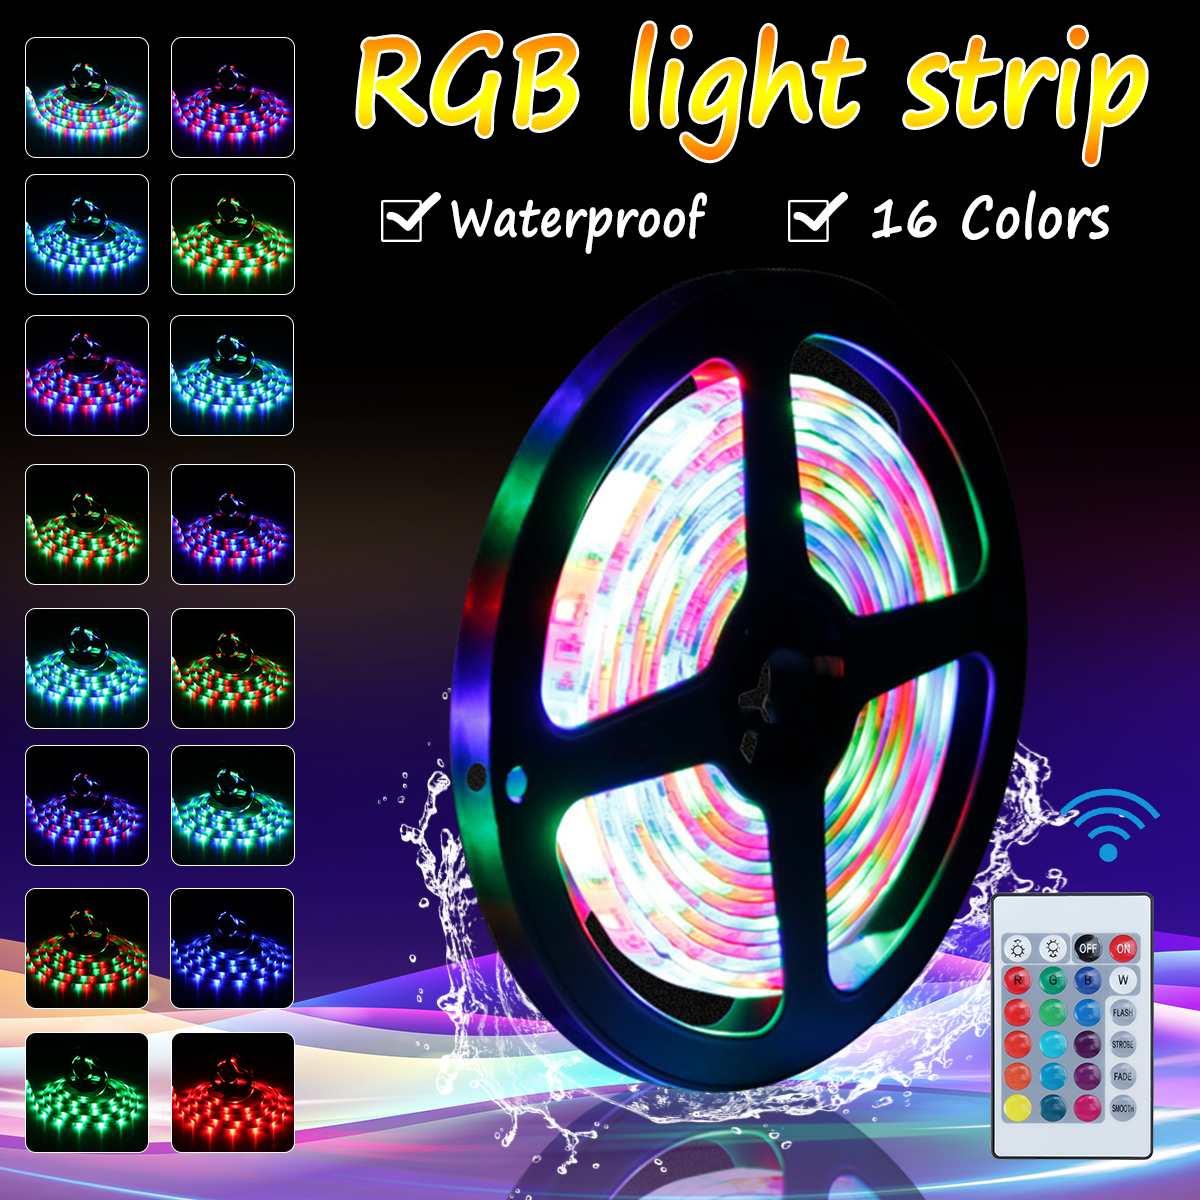 0.5m/1m/2m/3m/4m/5m 5V USB Powered Waterproof Led Strip Lights RGB Colour Changing Remote Control USB For Alexa